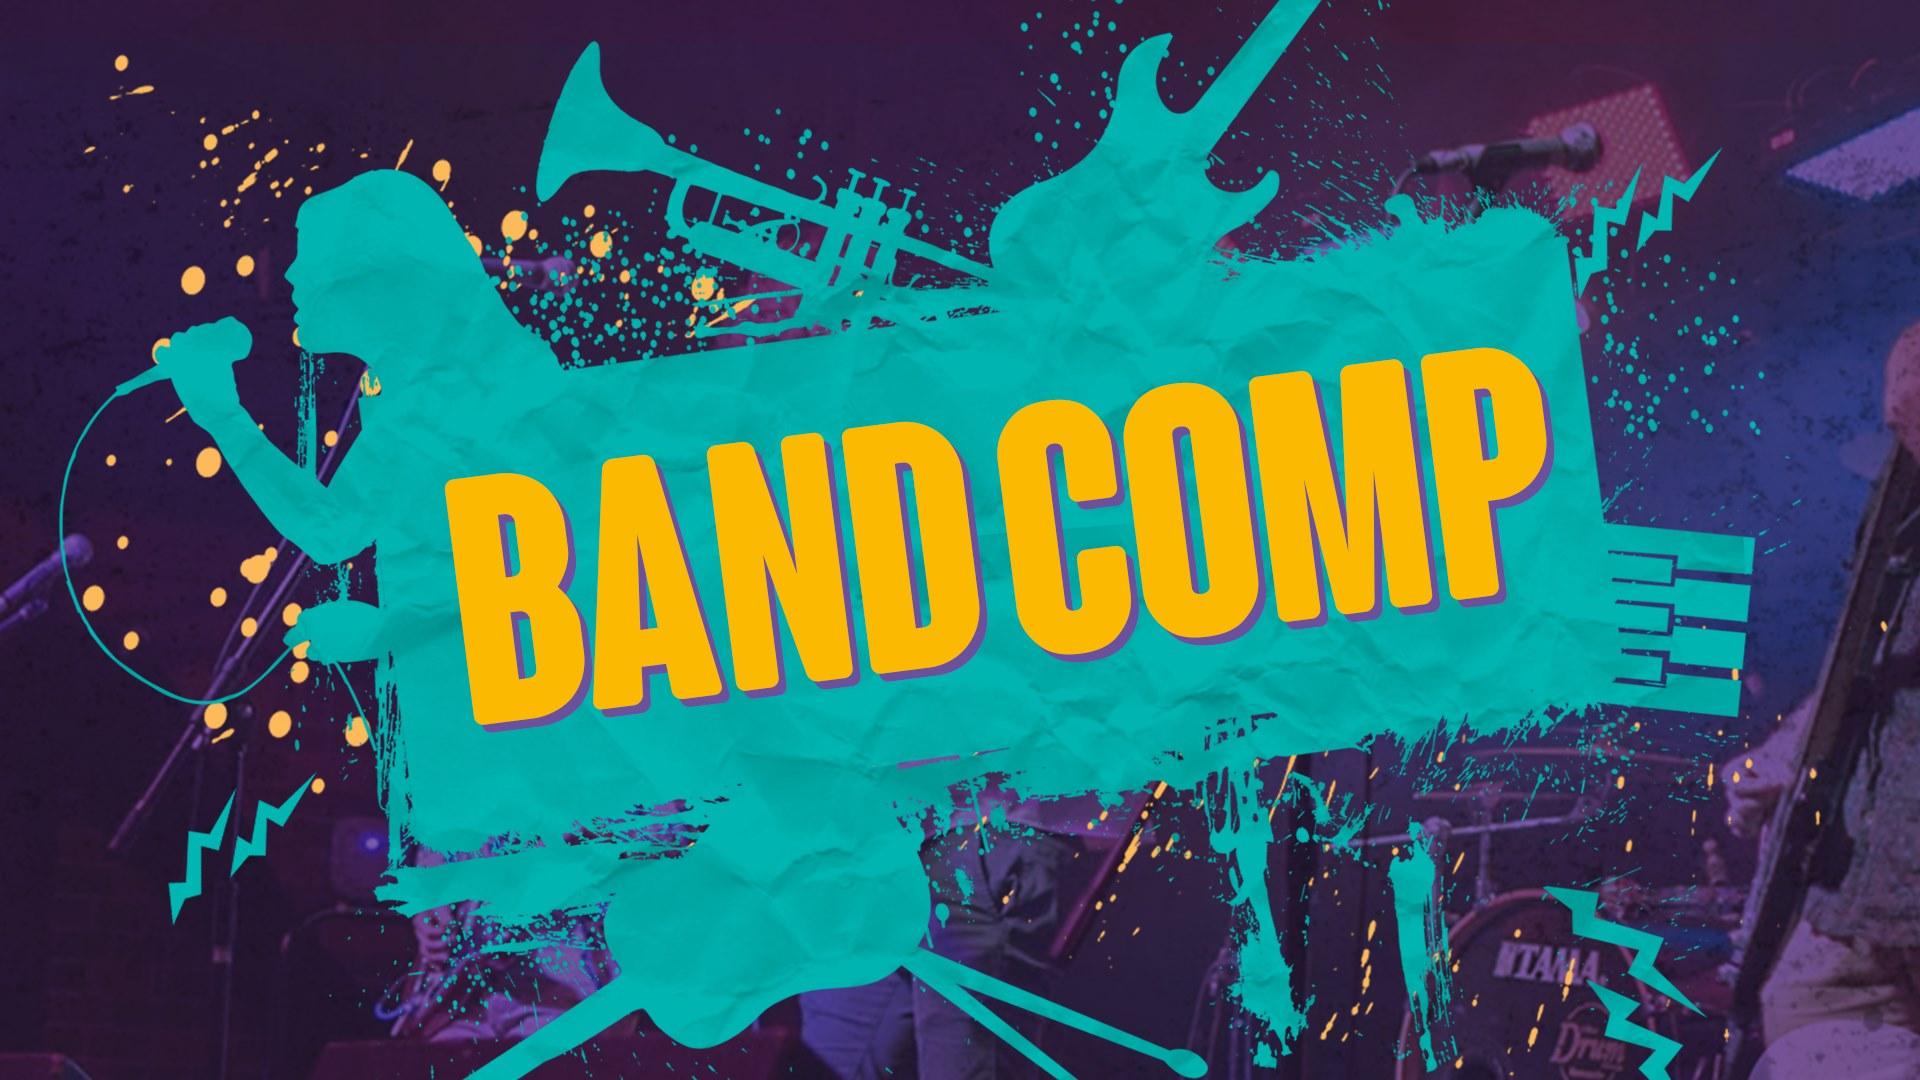 University of Newcastle Band Comp 2021